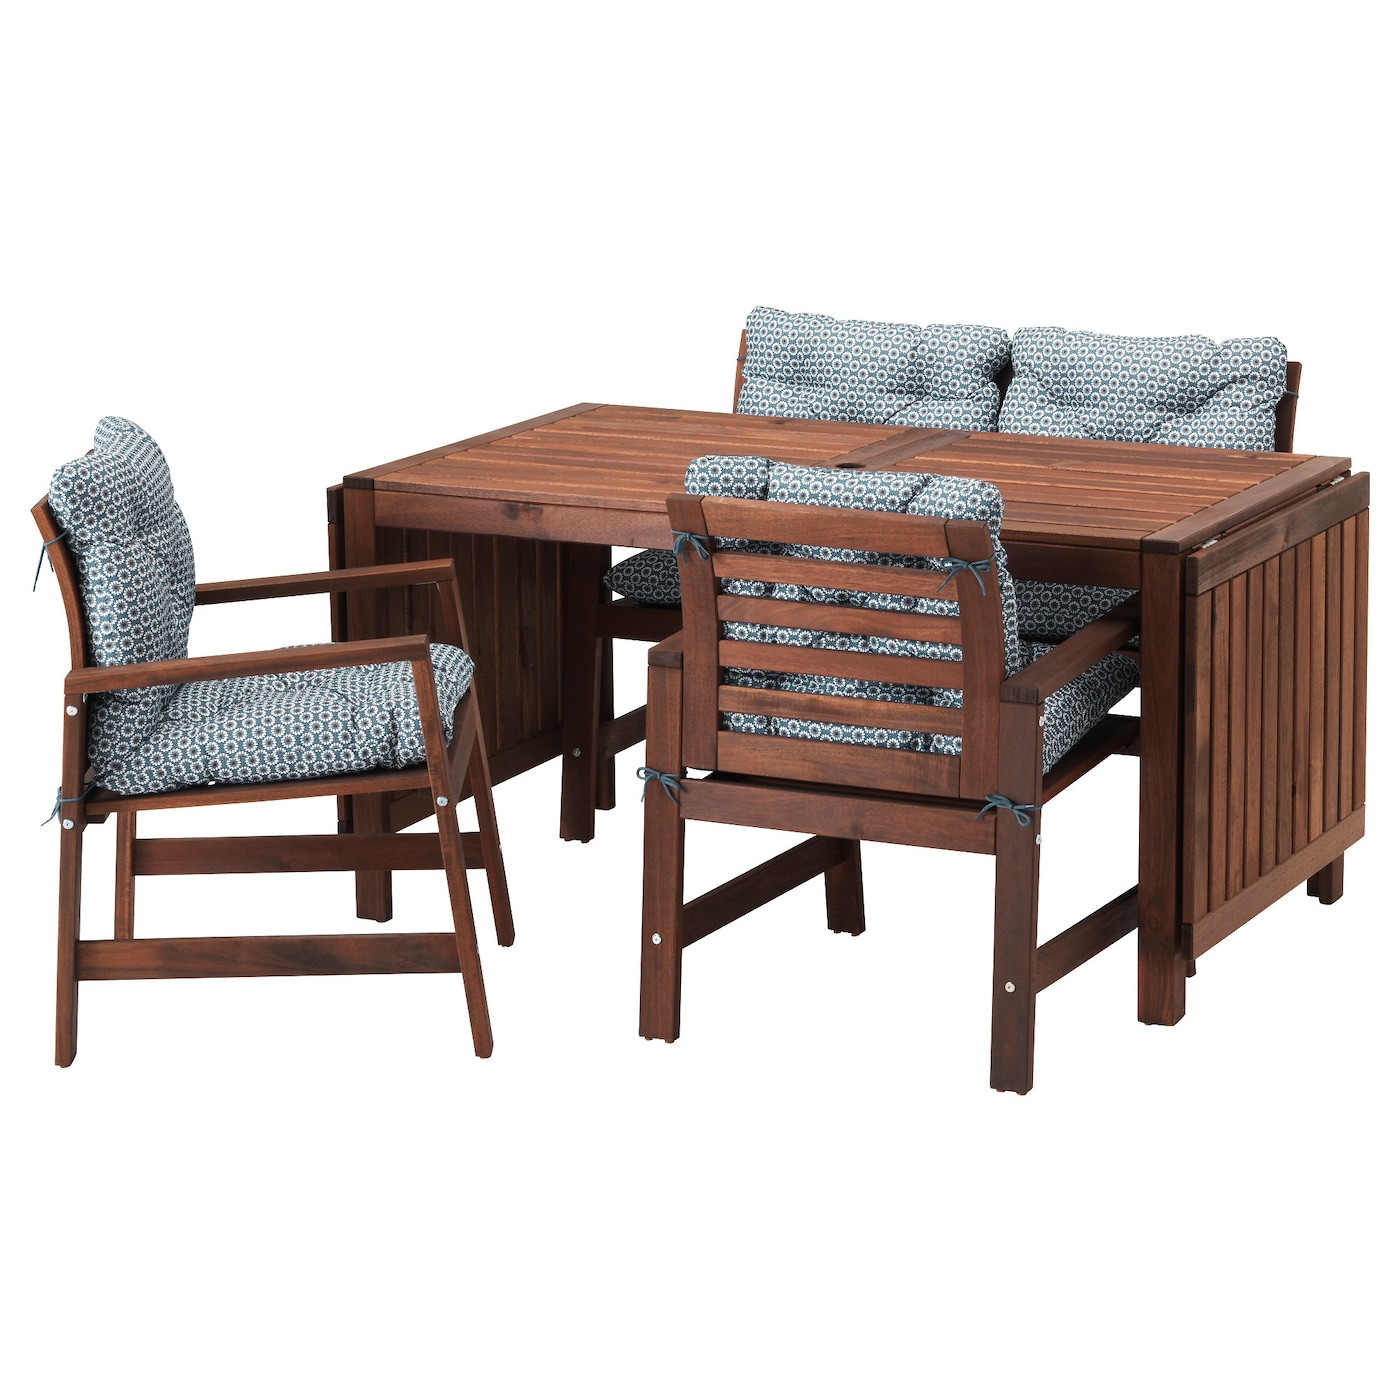 pplar tafel 2 tuinstoelen bank buiten bruin gelazuurd ytter n blauw ikea. Black Bedroom Furniture Sets. Home Design Ideas